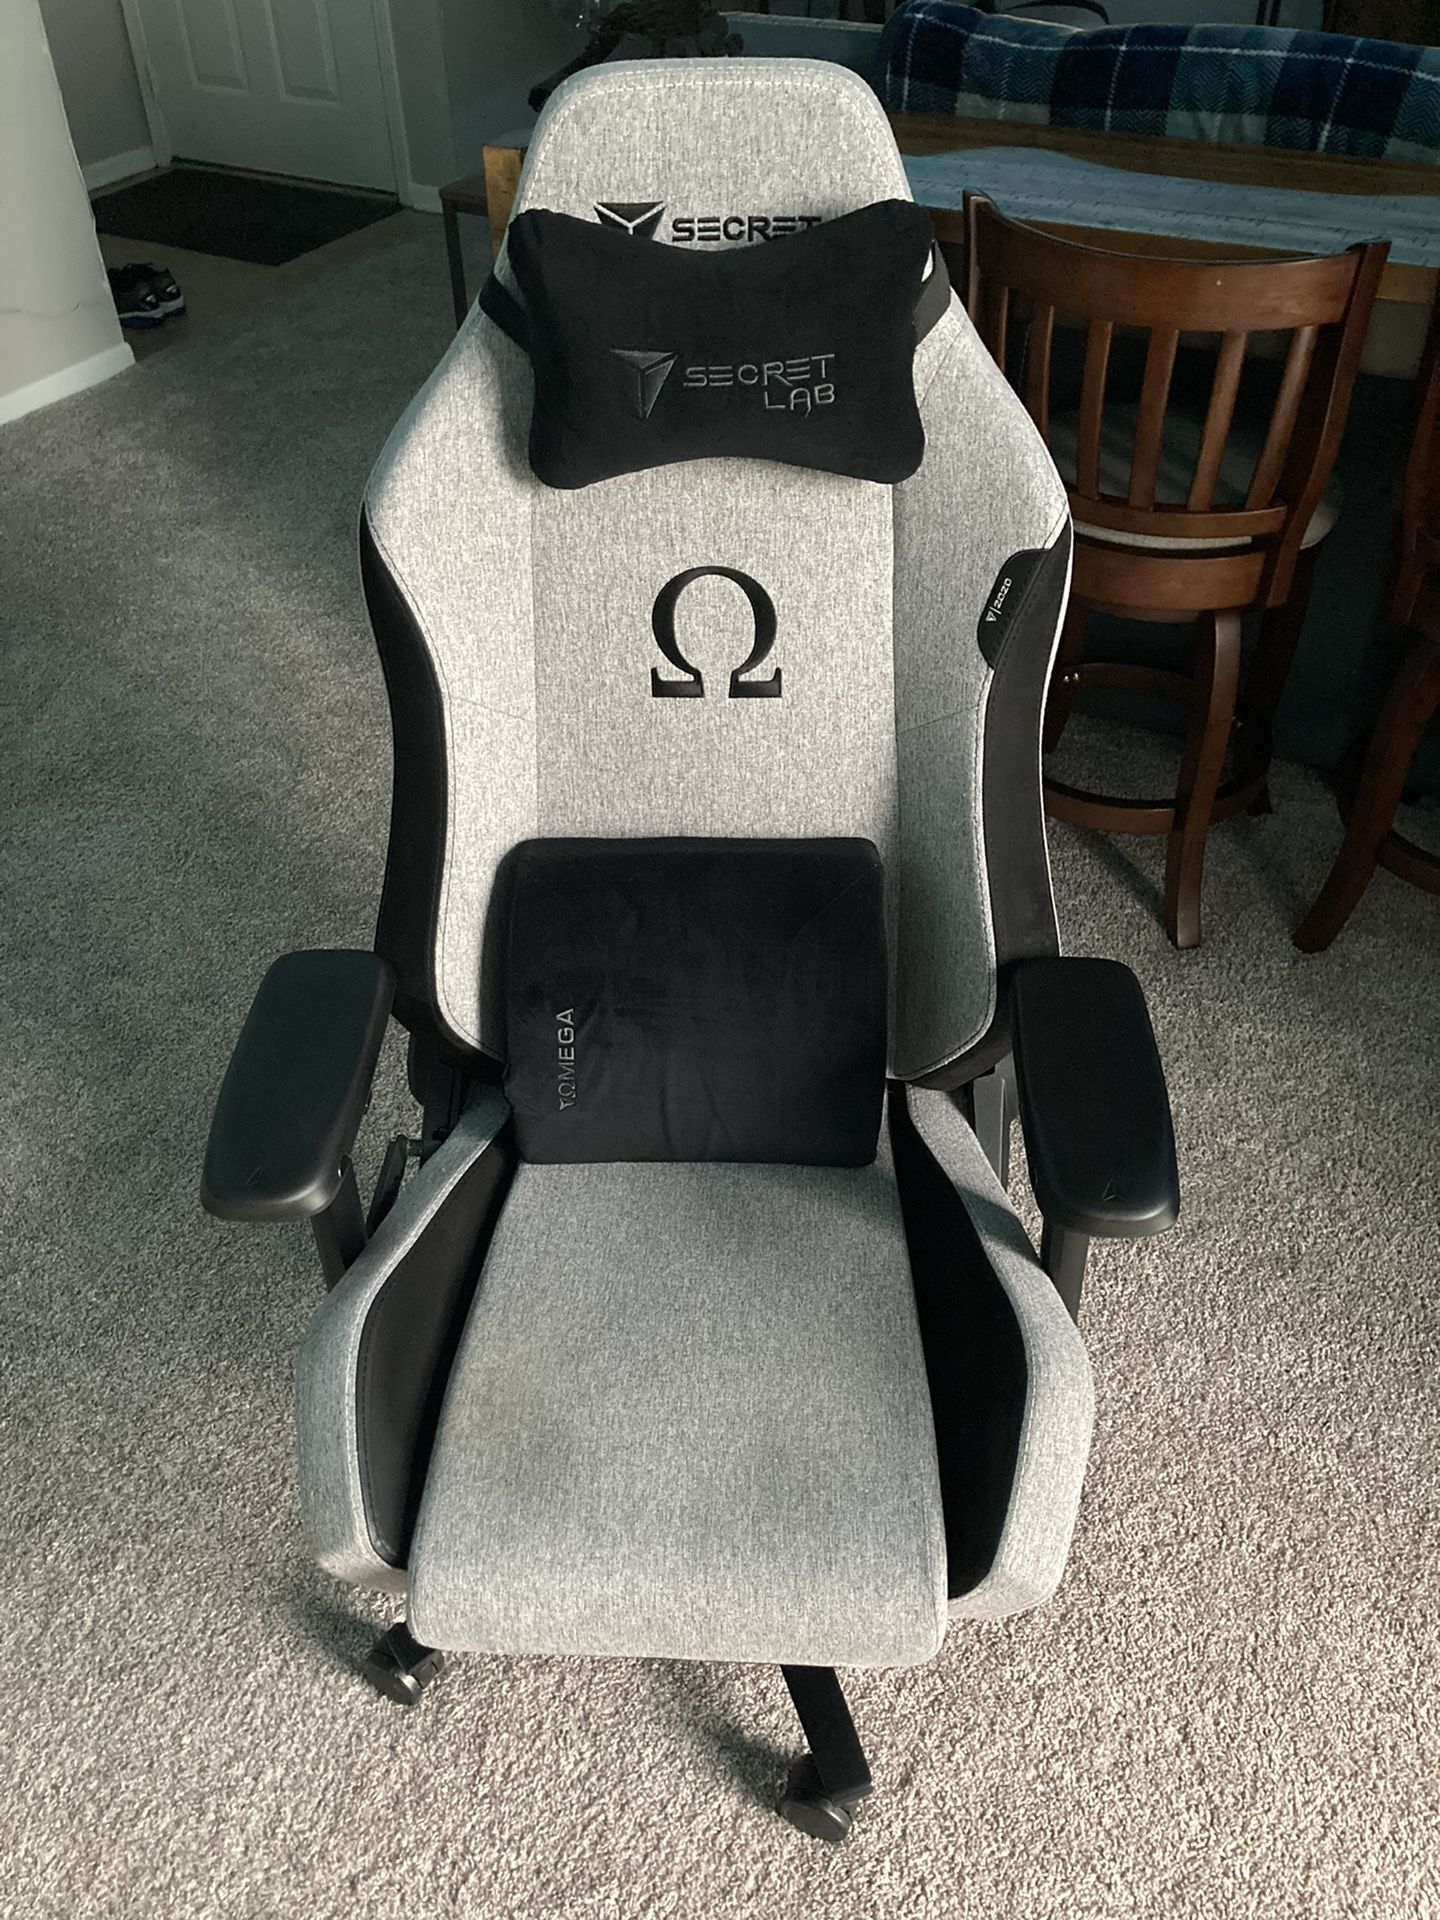 Secret Lab Chair